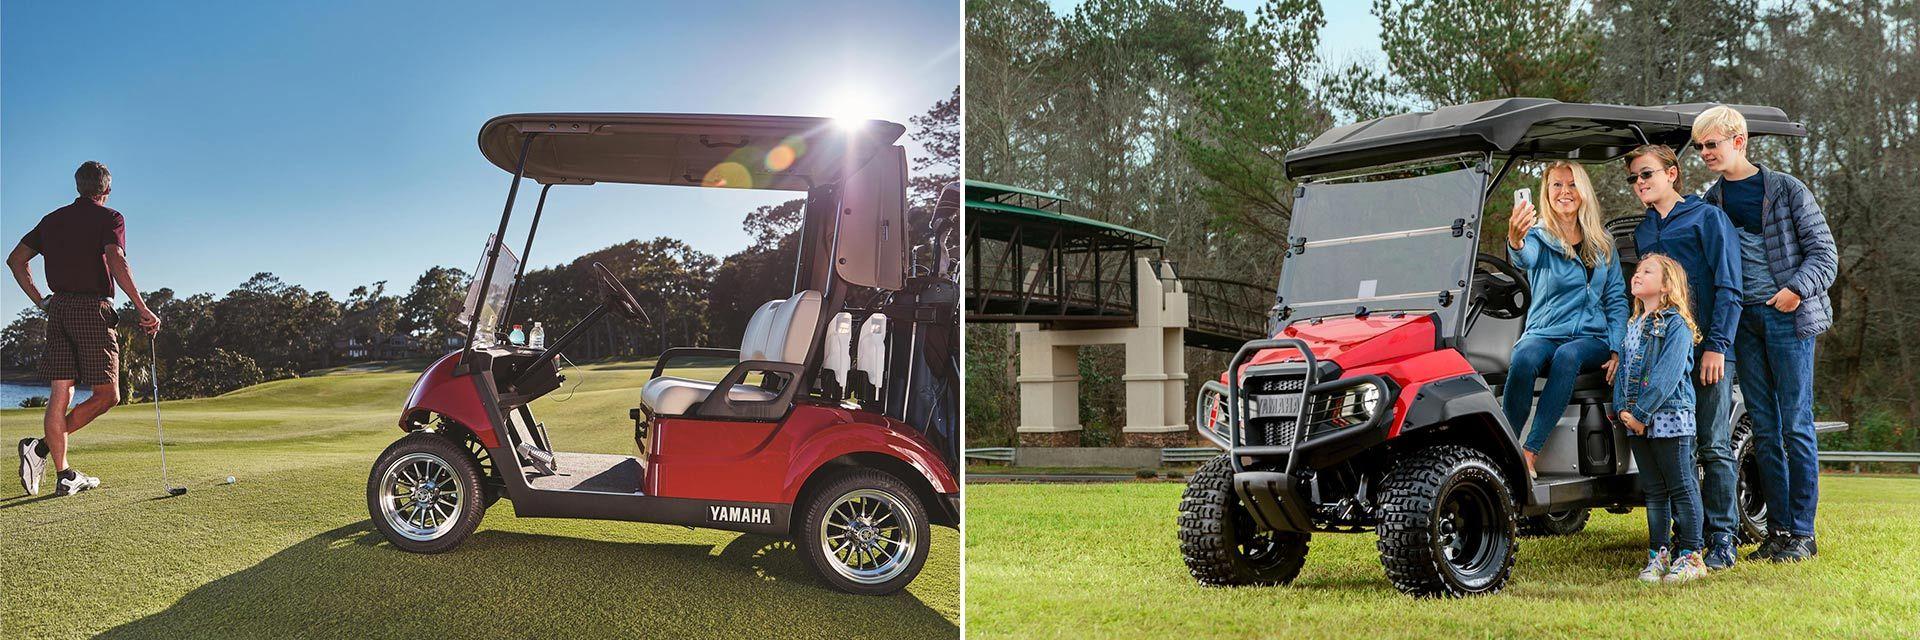 Fat Boys Golf Carts in Covington & Athens, GA   Golf Cart